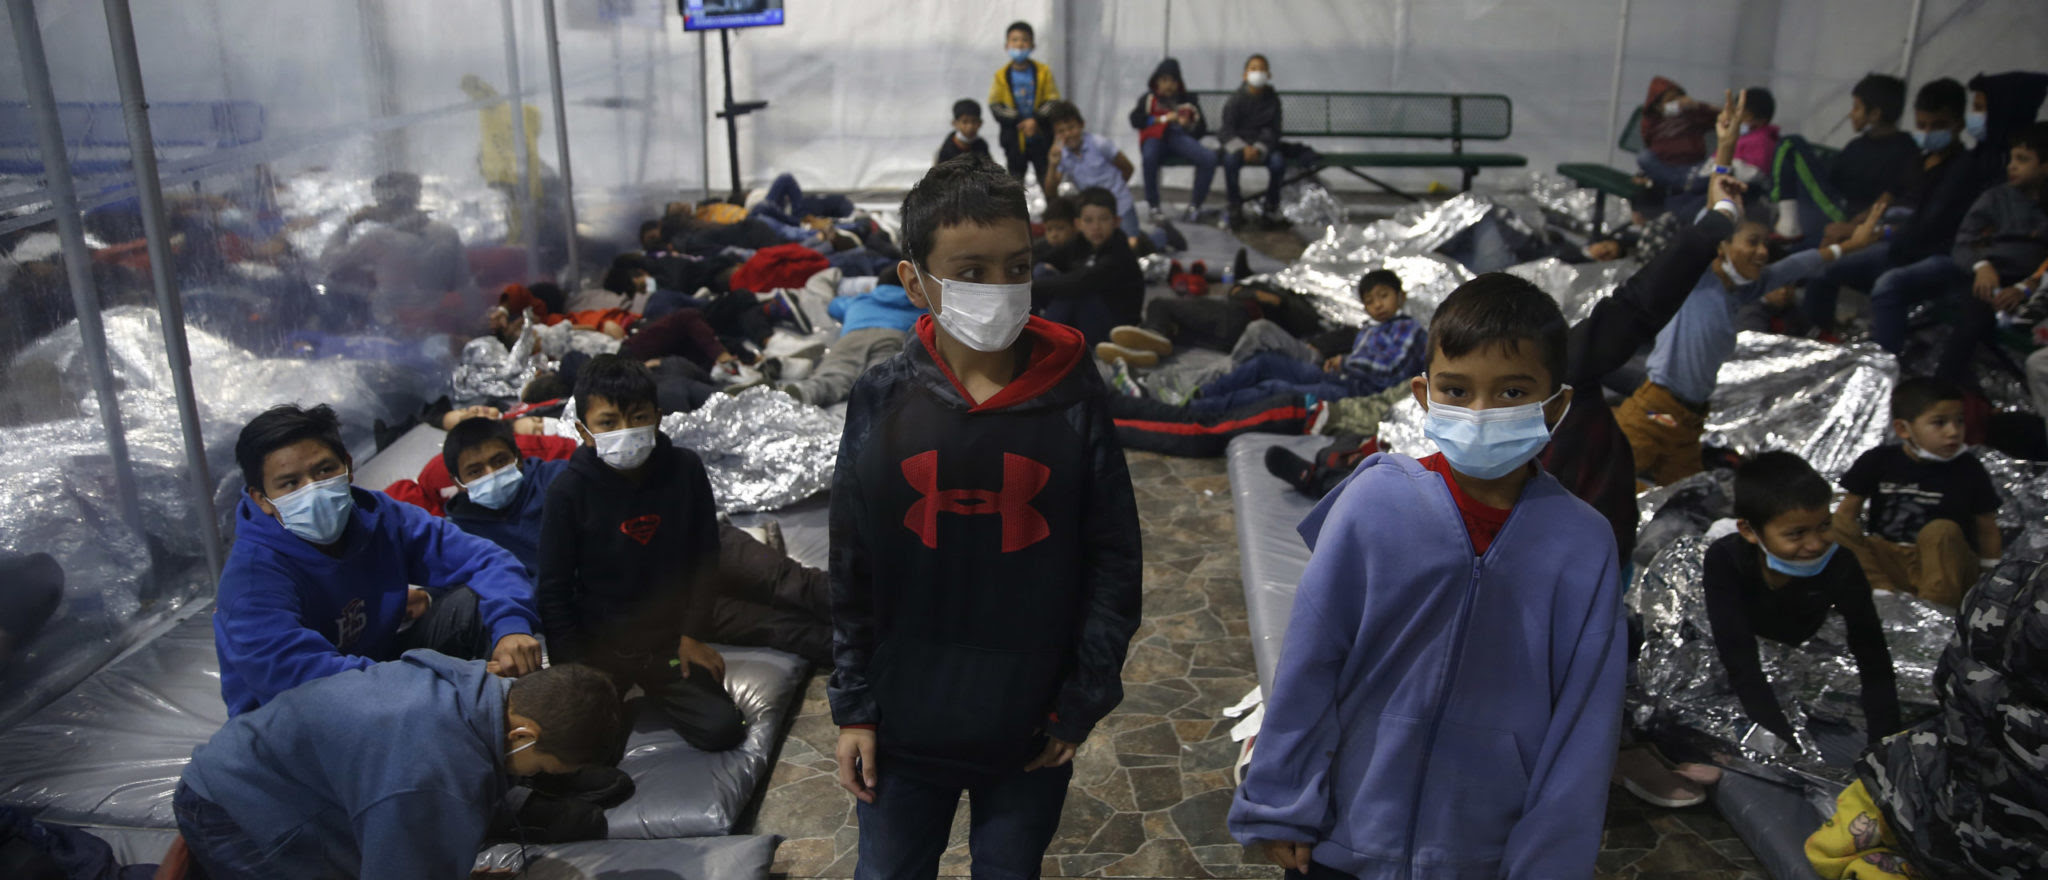 Migrant children at a facility